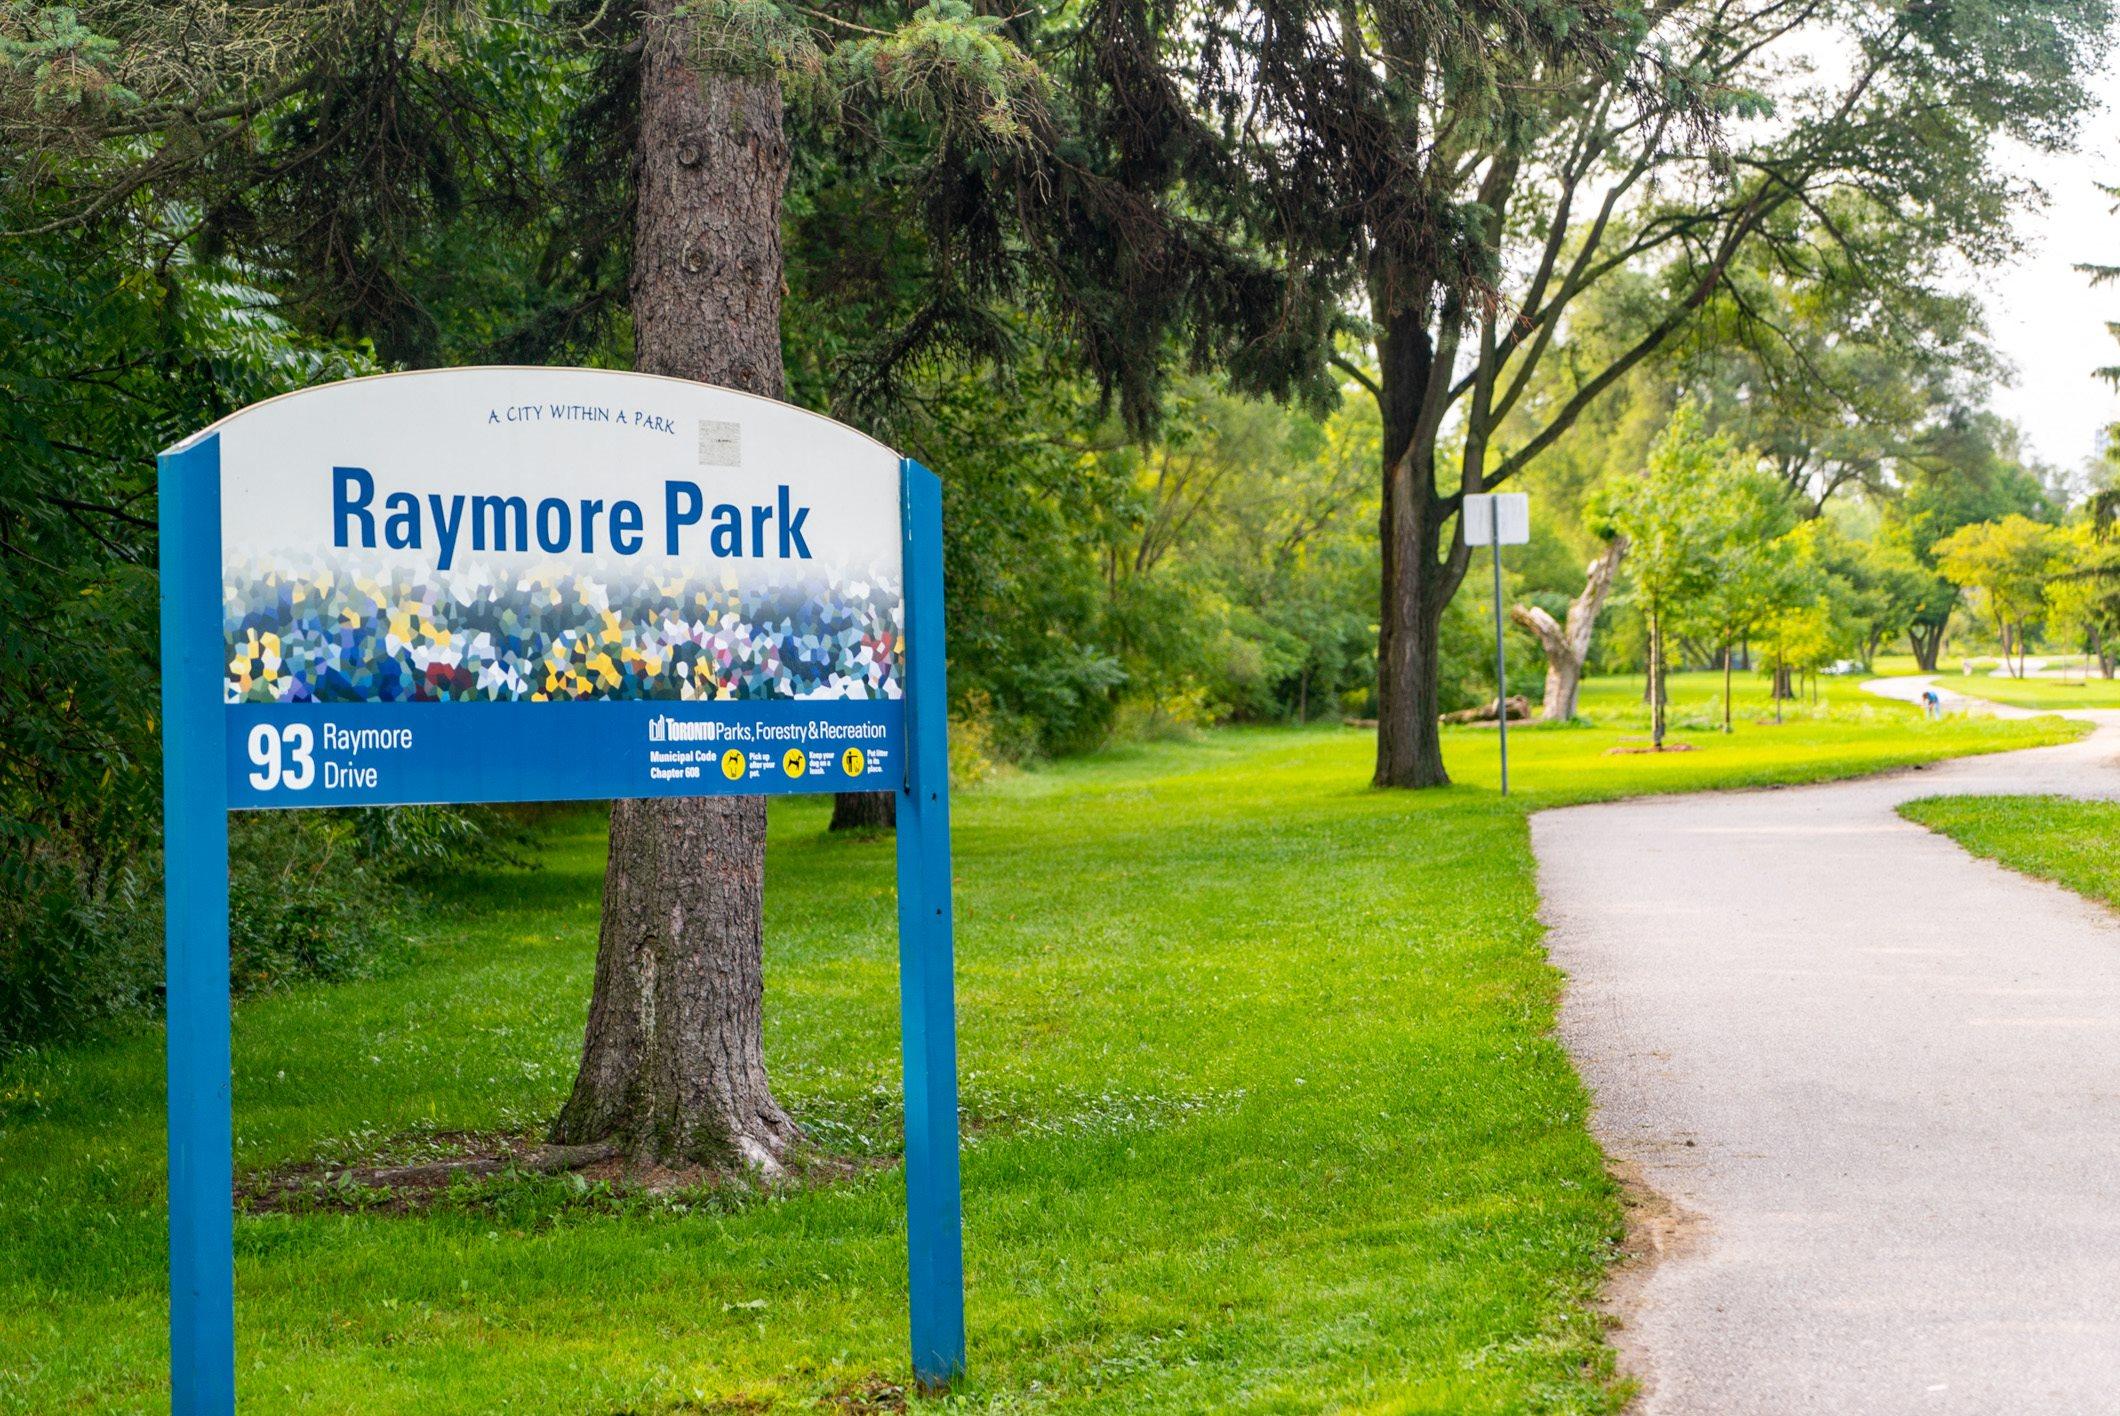 Raymore park